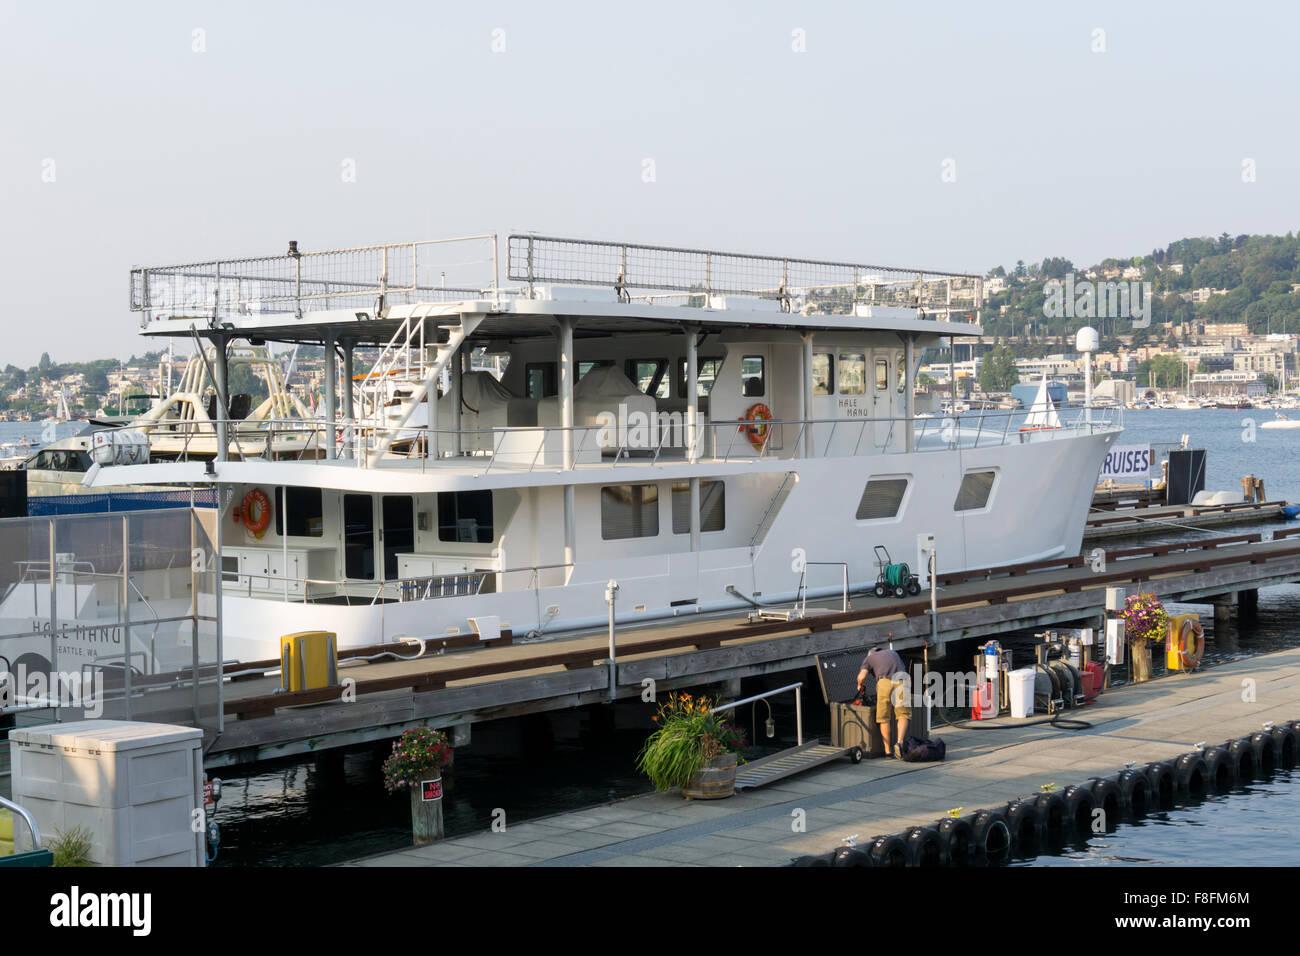 Bill Gates' floating heliport, the MV Hale Manu, moored in Seattle. - Stock Image